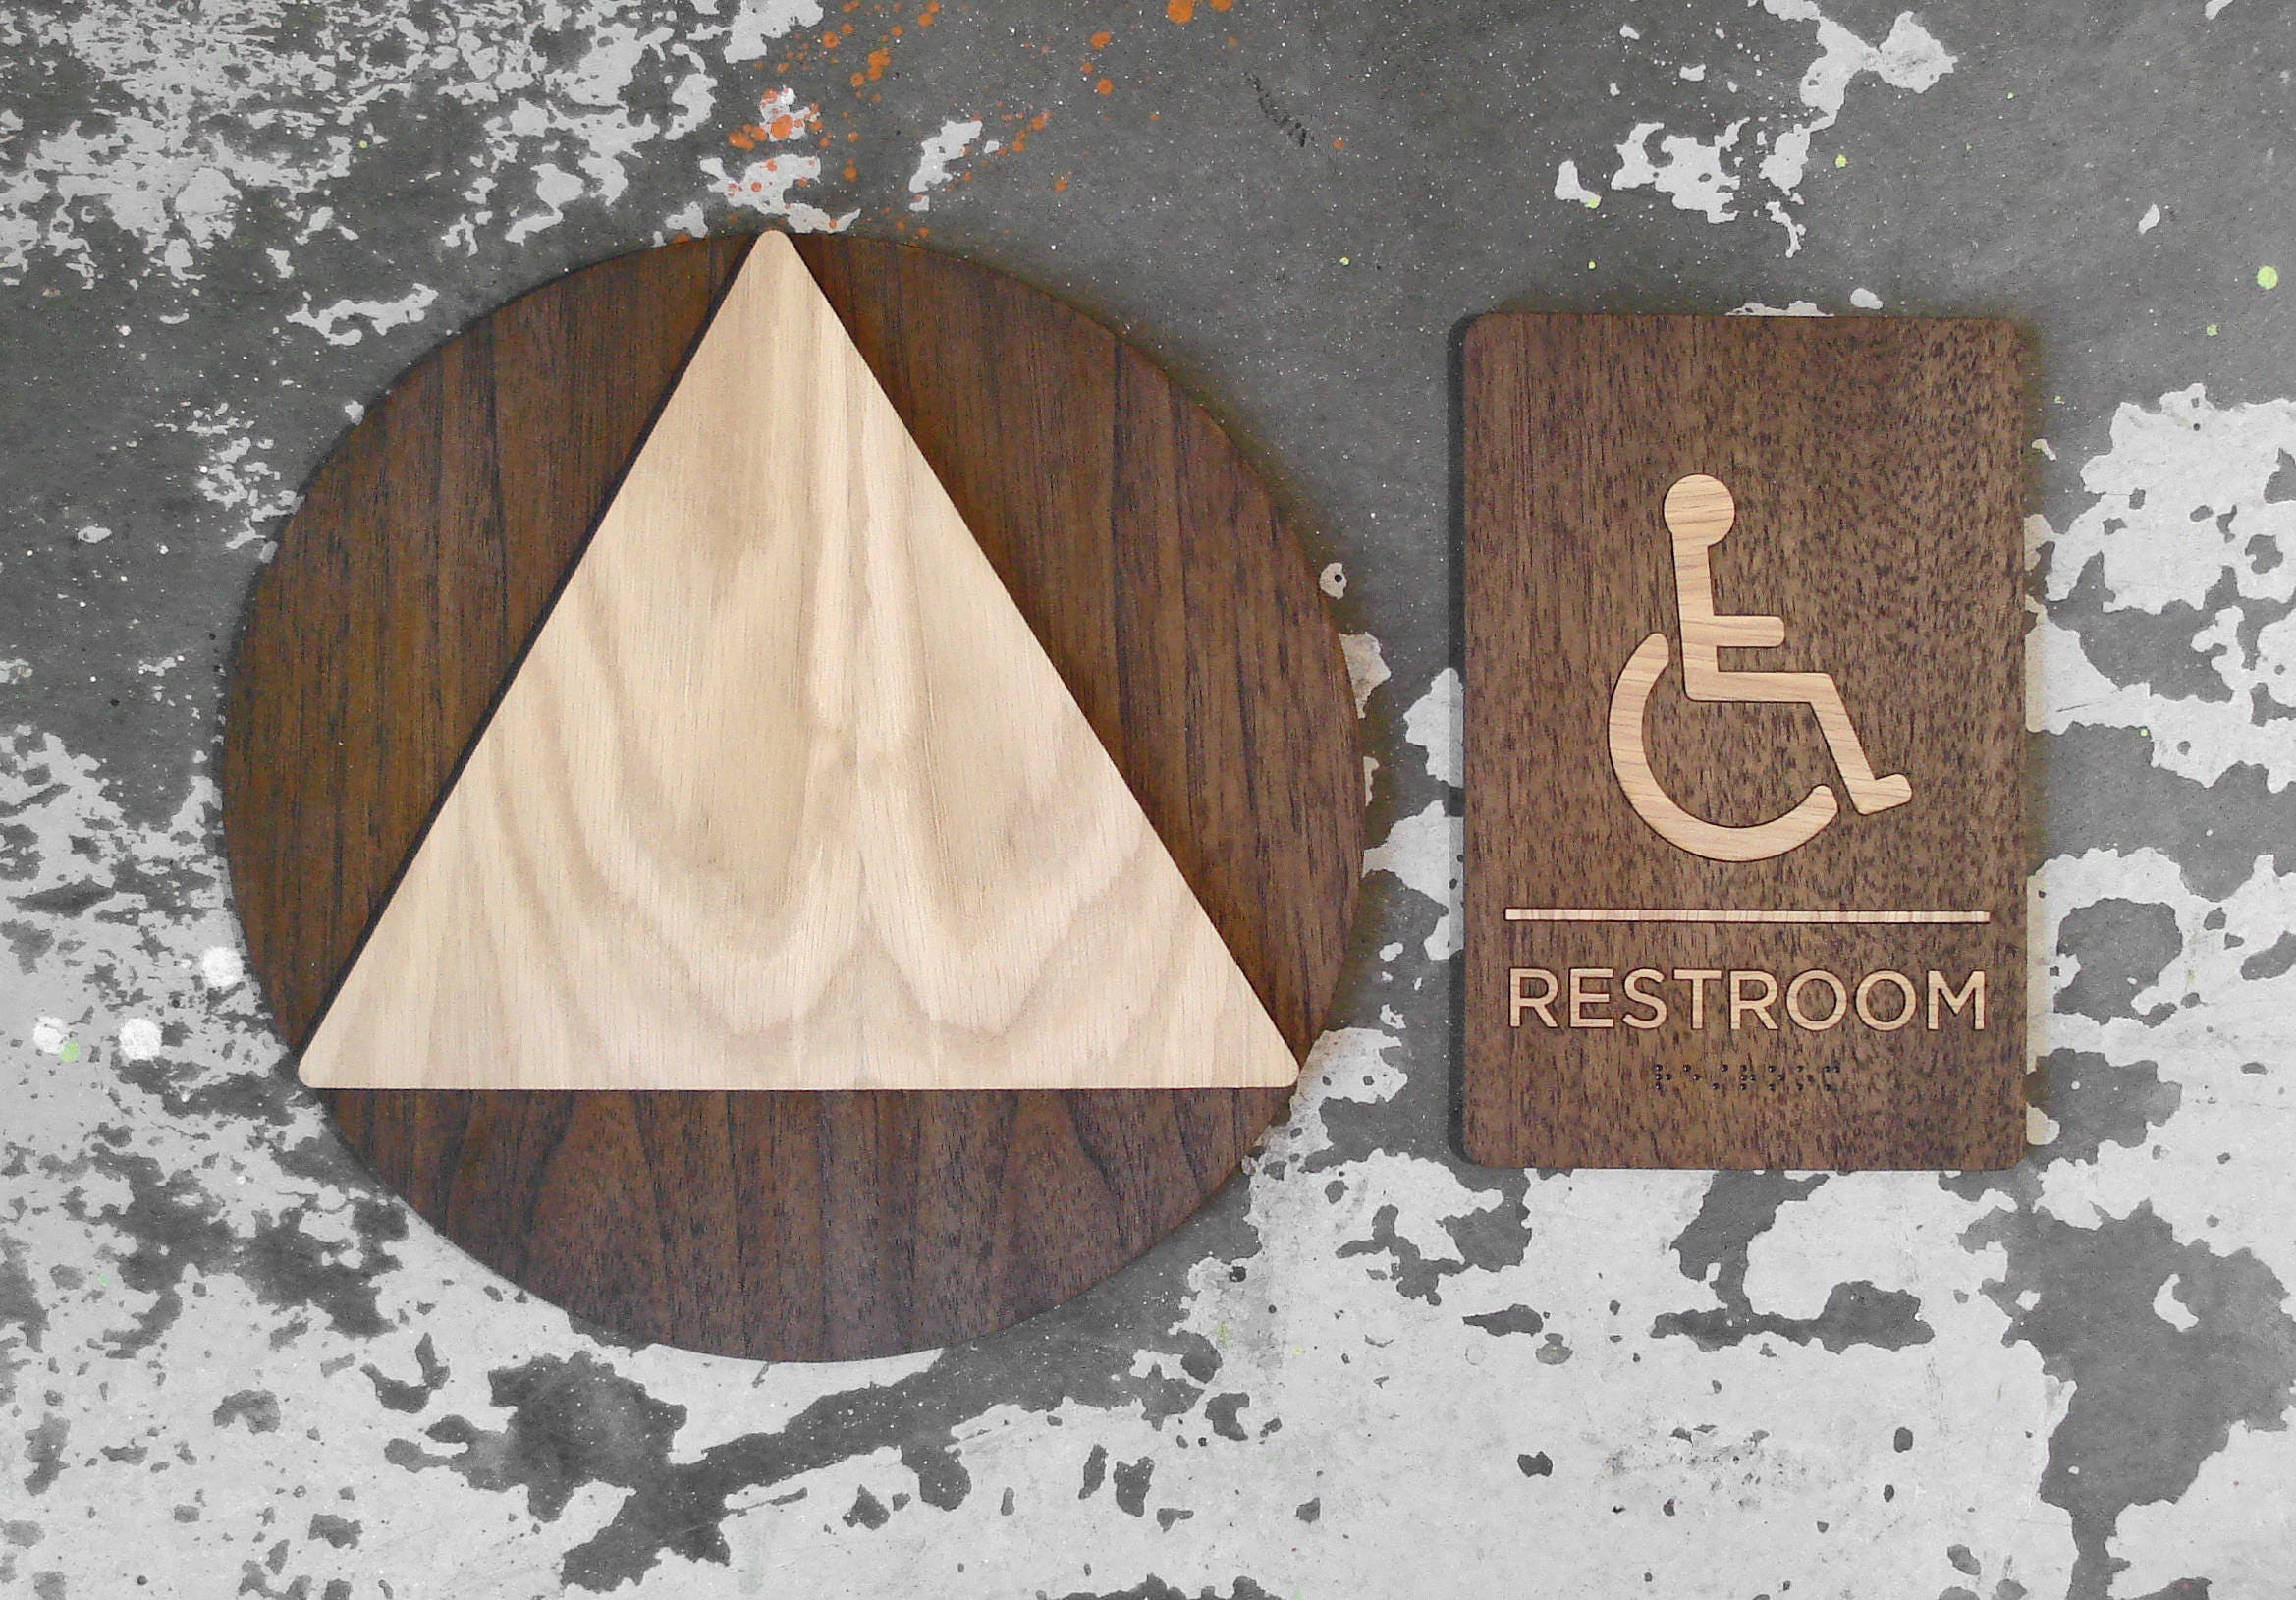 Bathroom Signs California california ab 1732 restroom signs ada unisex bathroom set